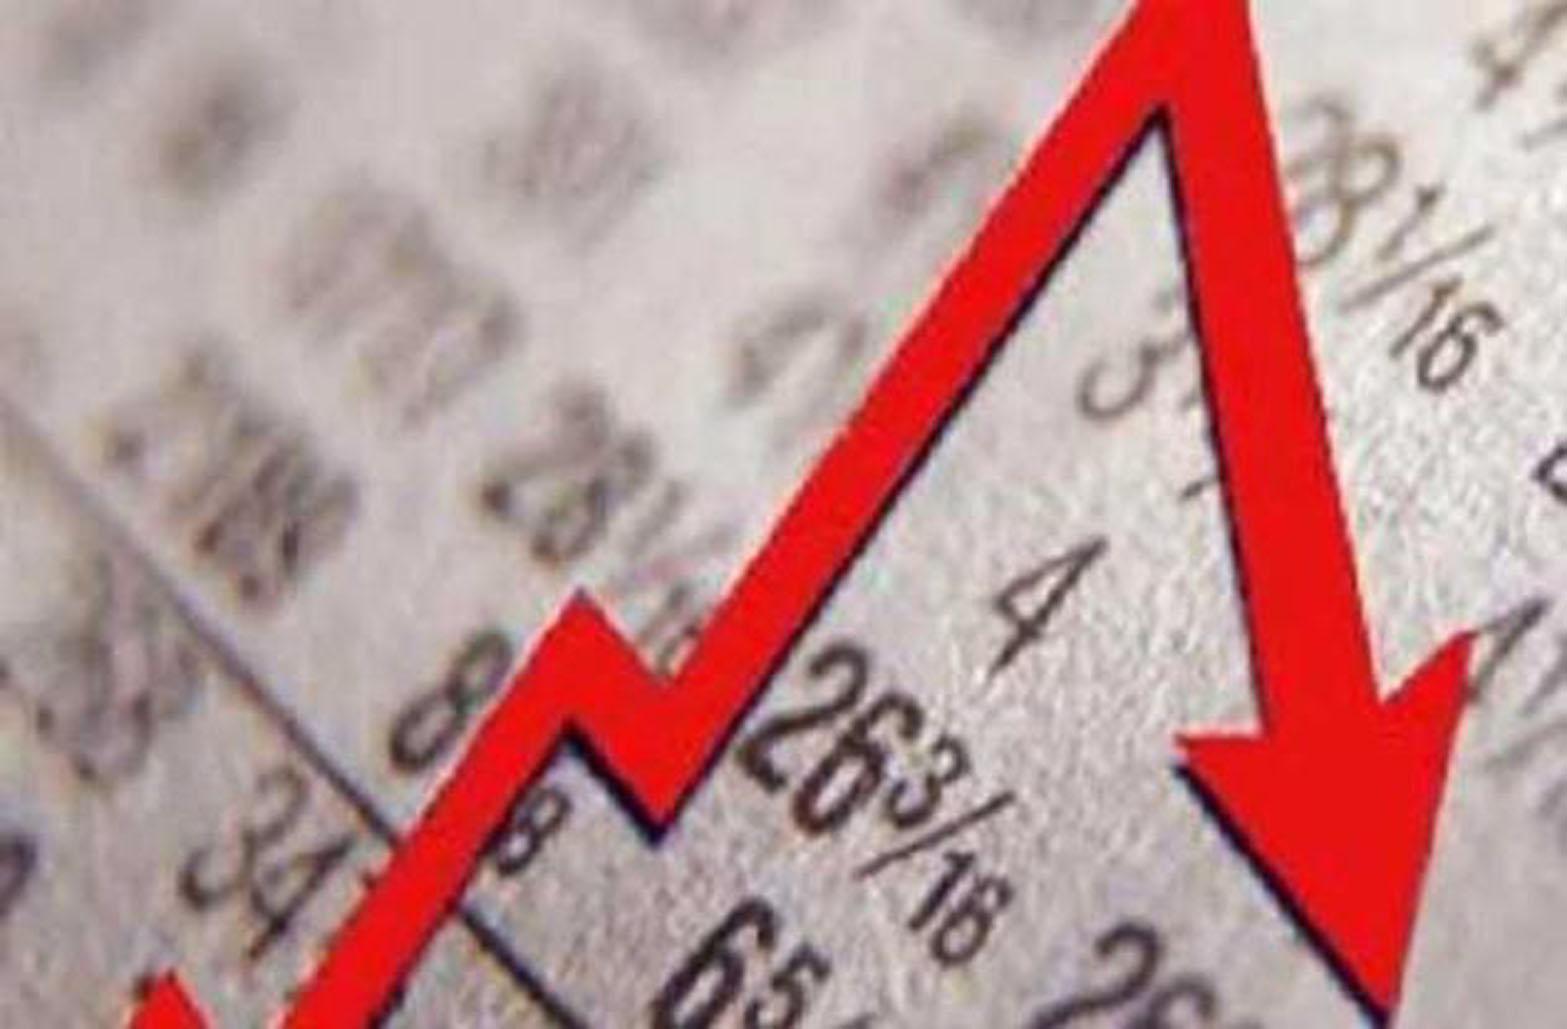 Turska: Indeks potrošačkih cena porastao 11,76% na godišnjem, a 0,58% na mesečnom nivou